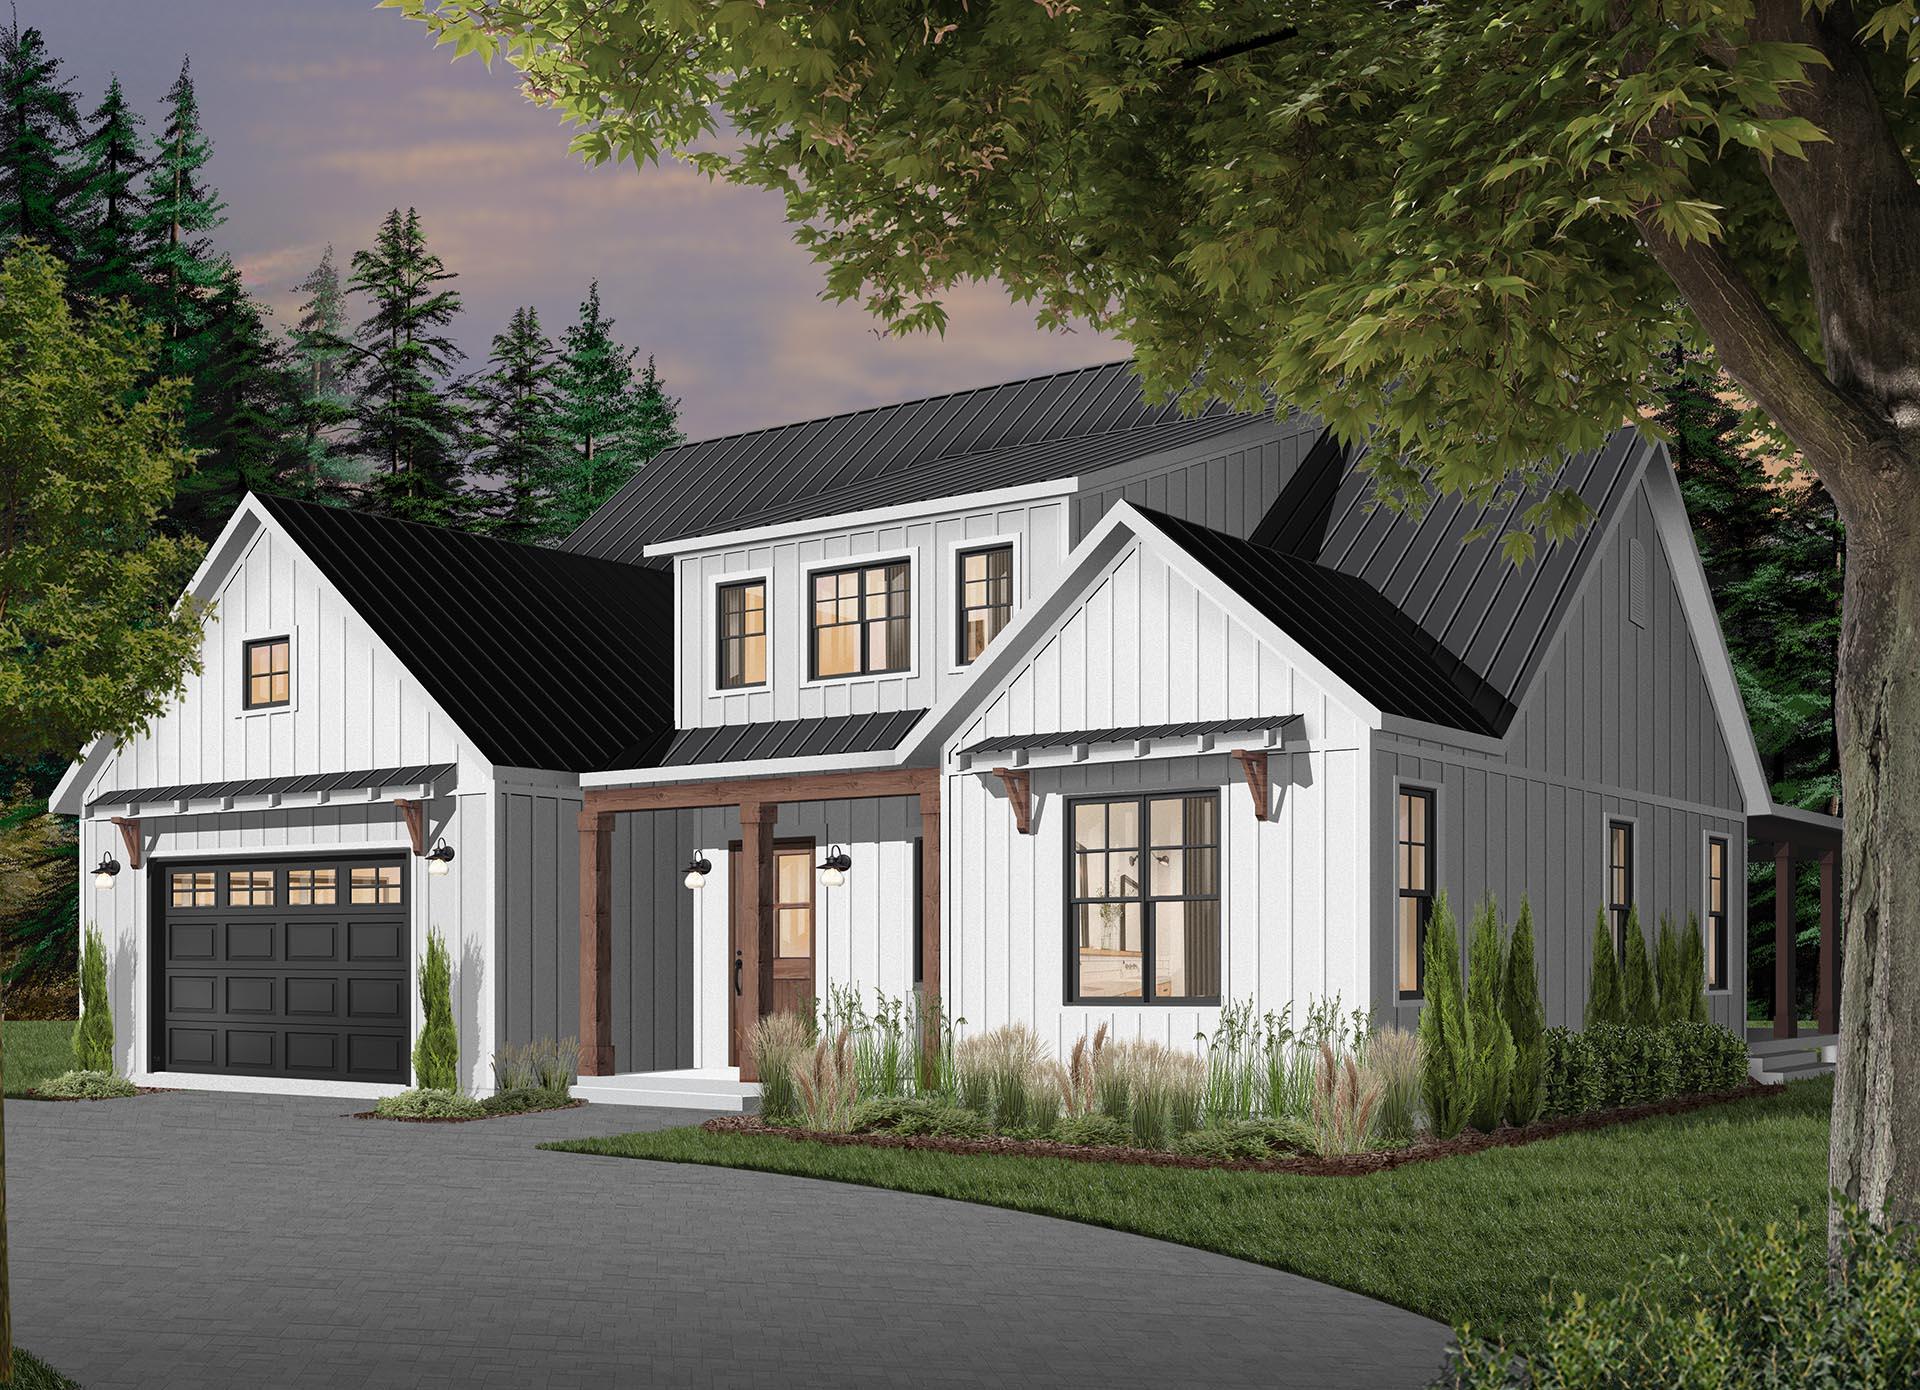 Plan Maison 2 Chambres 1 S Bain Garage 6102 14